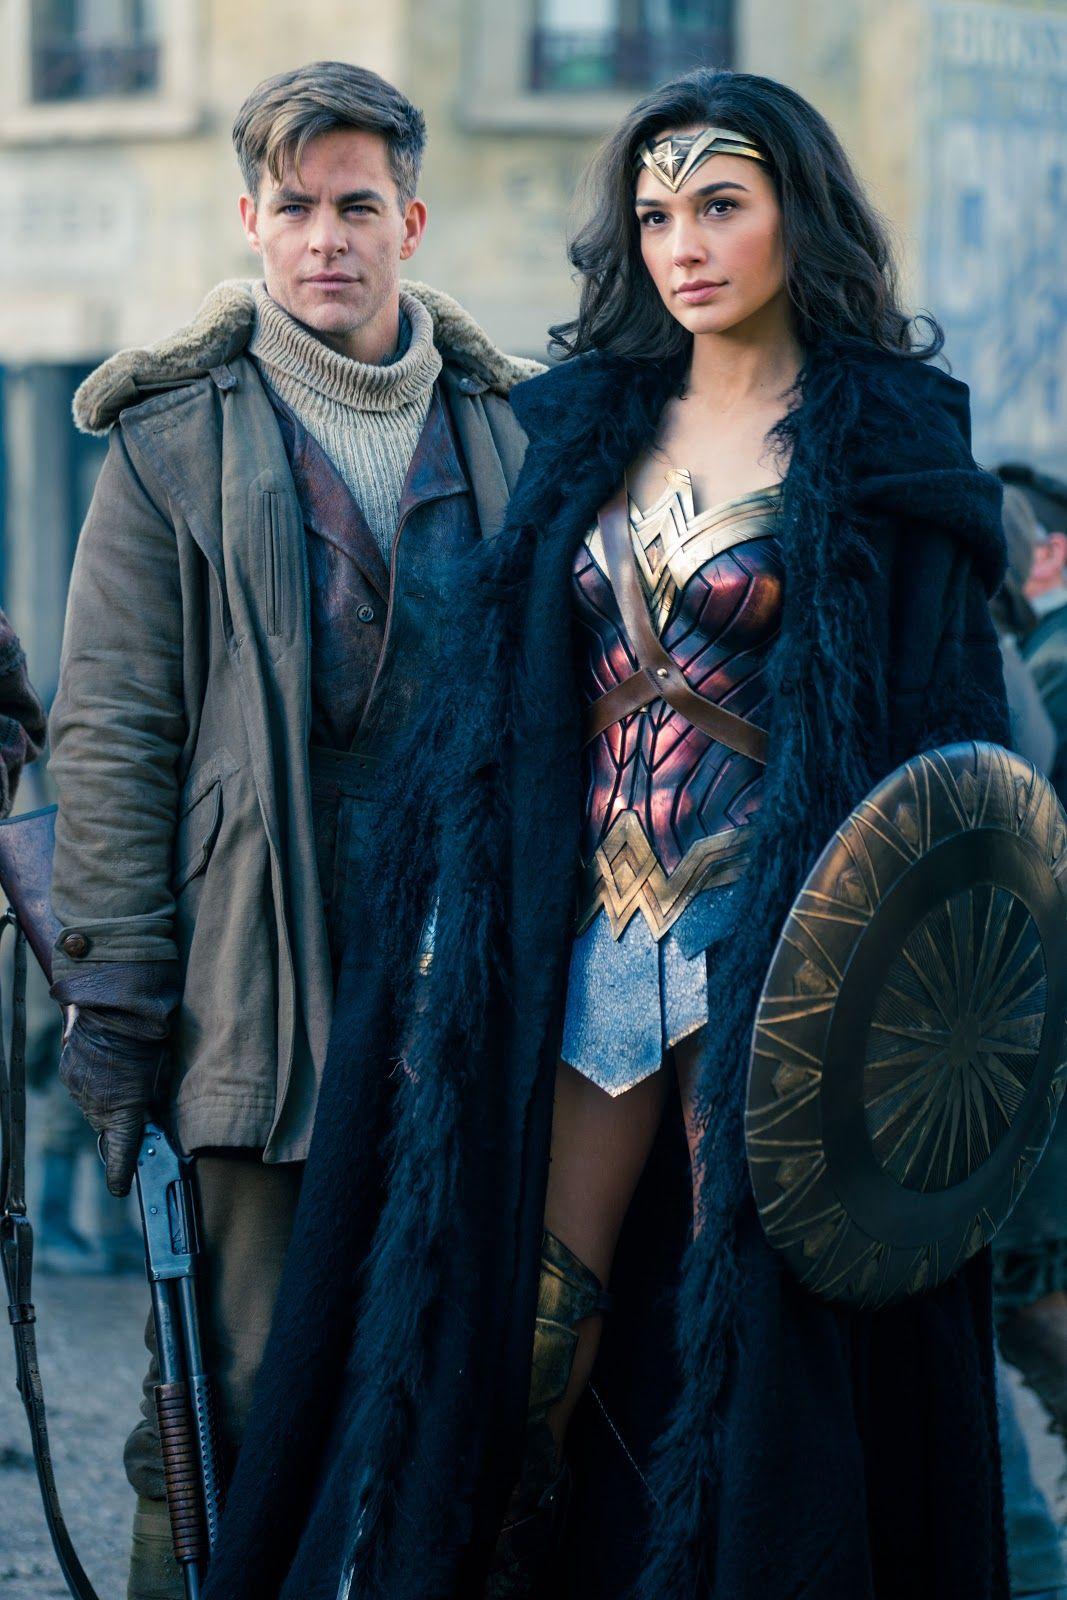 New Hi Res Wonder Woman Stills Released Online Page 15 Of 20 Gal Gadot Wonder Woman Wonder Woman Movie Wonder Woman